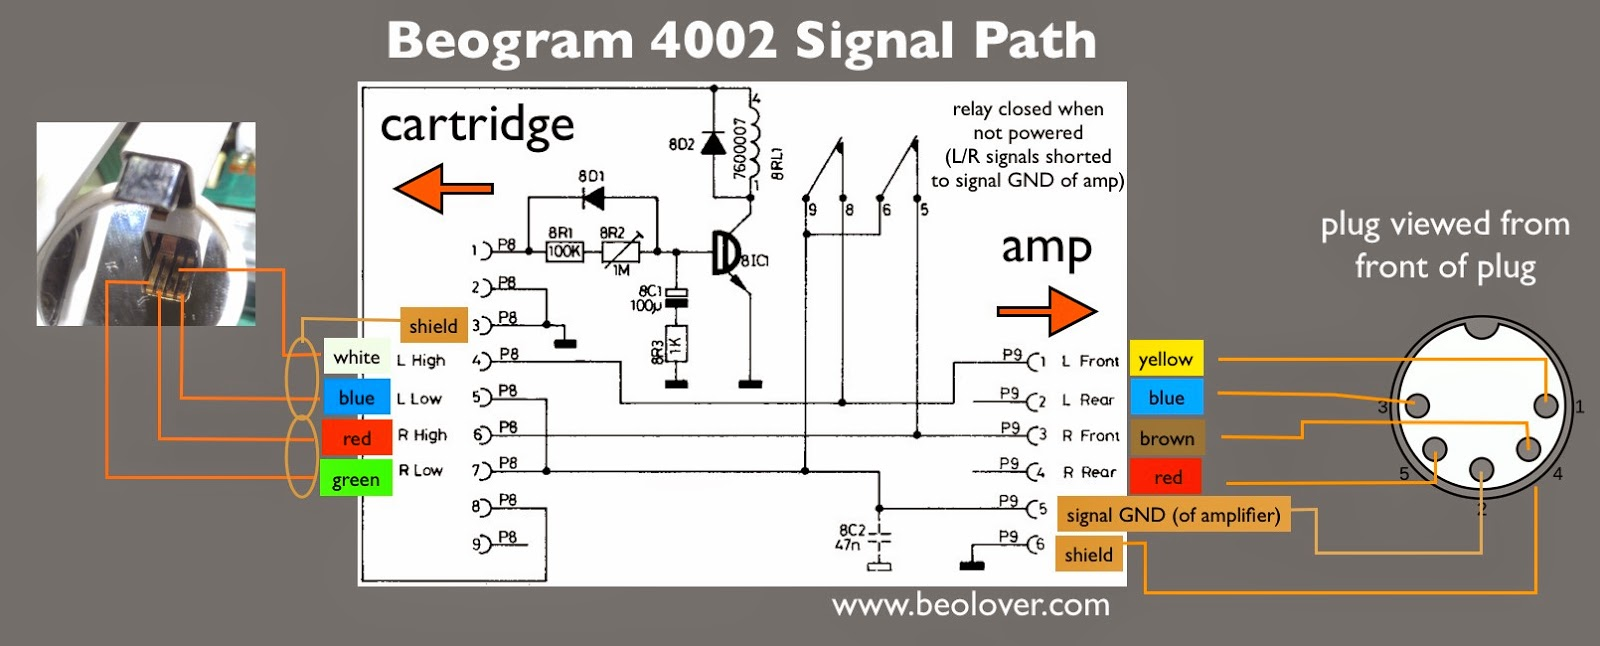 Beolover  Beogram 4002  Final Tasks  Adjustments  U0026 Playing Records